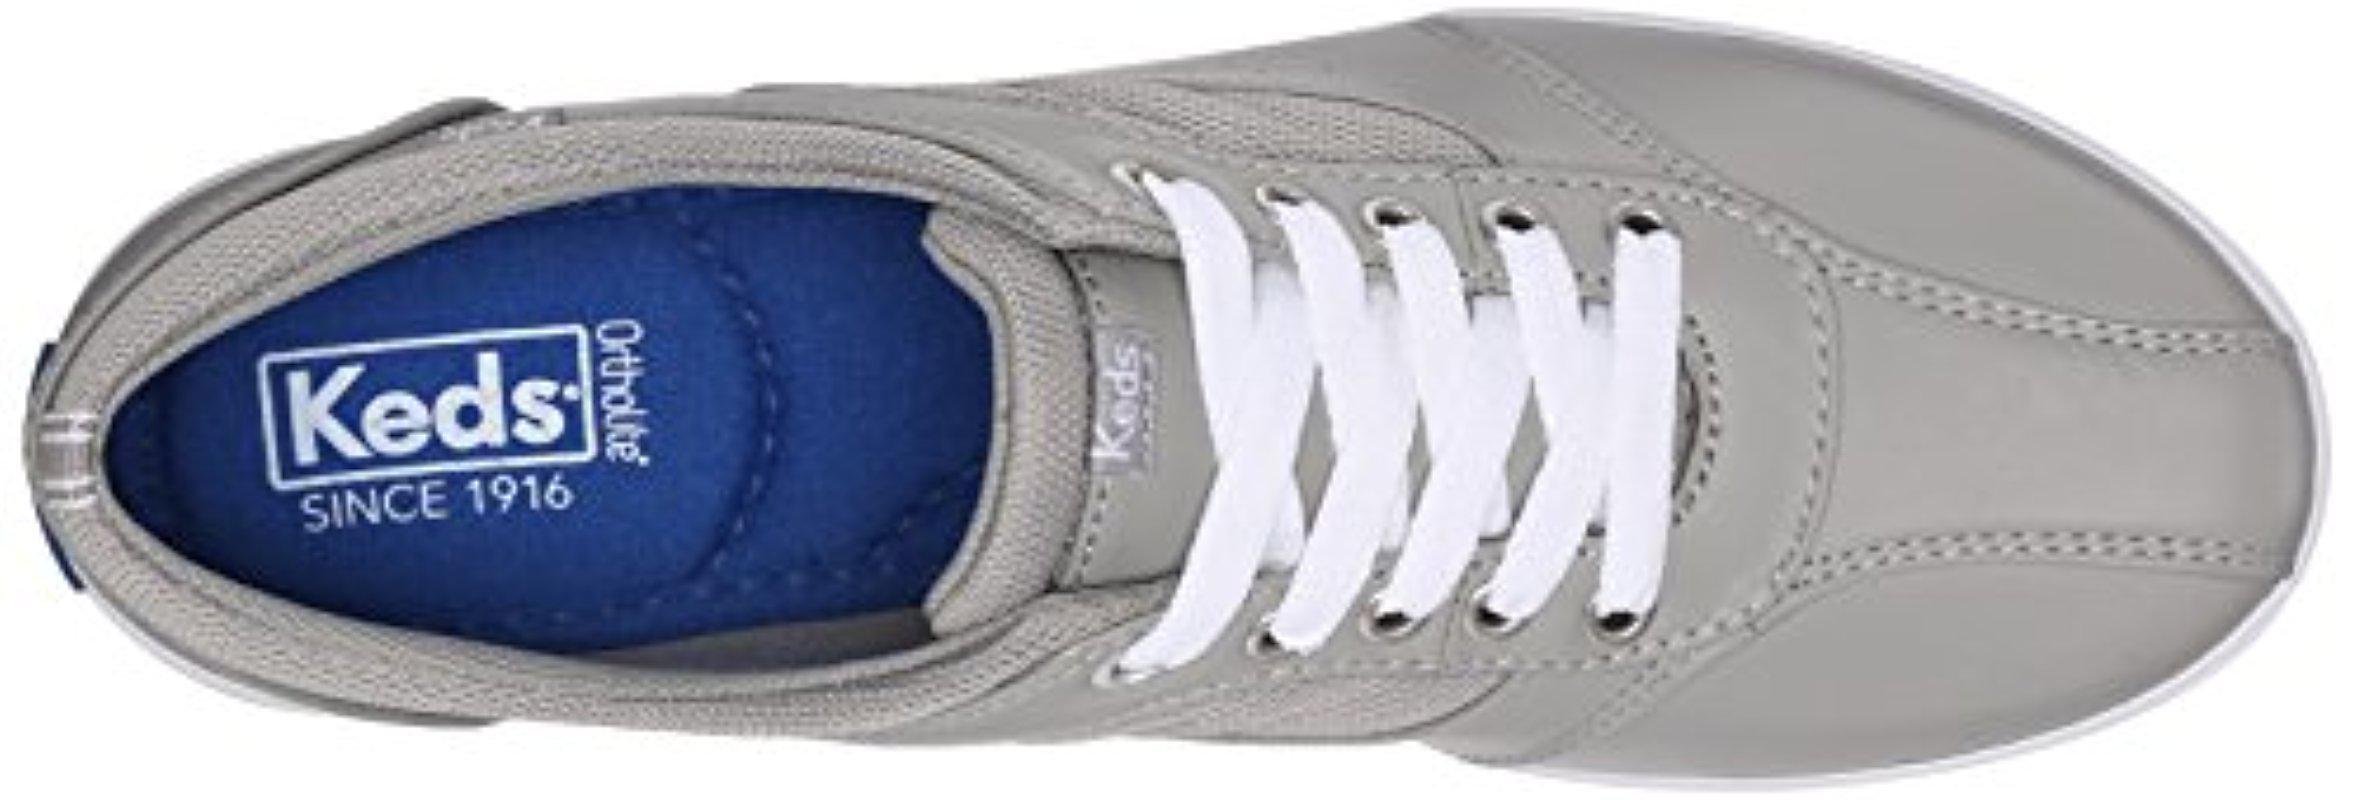 Keds Prestige Fashion Sneaker,gray